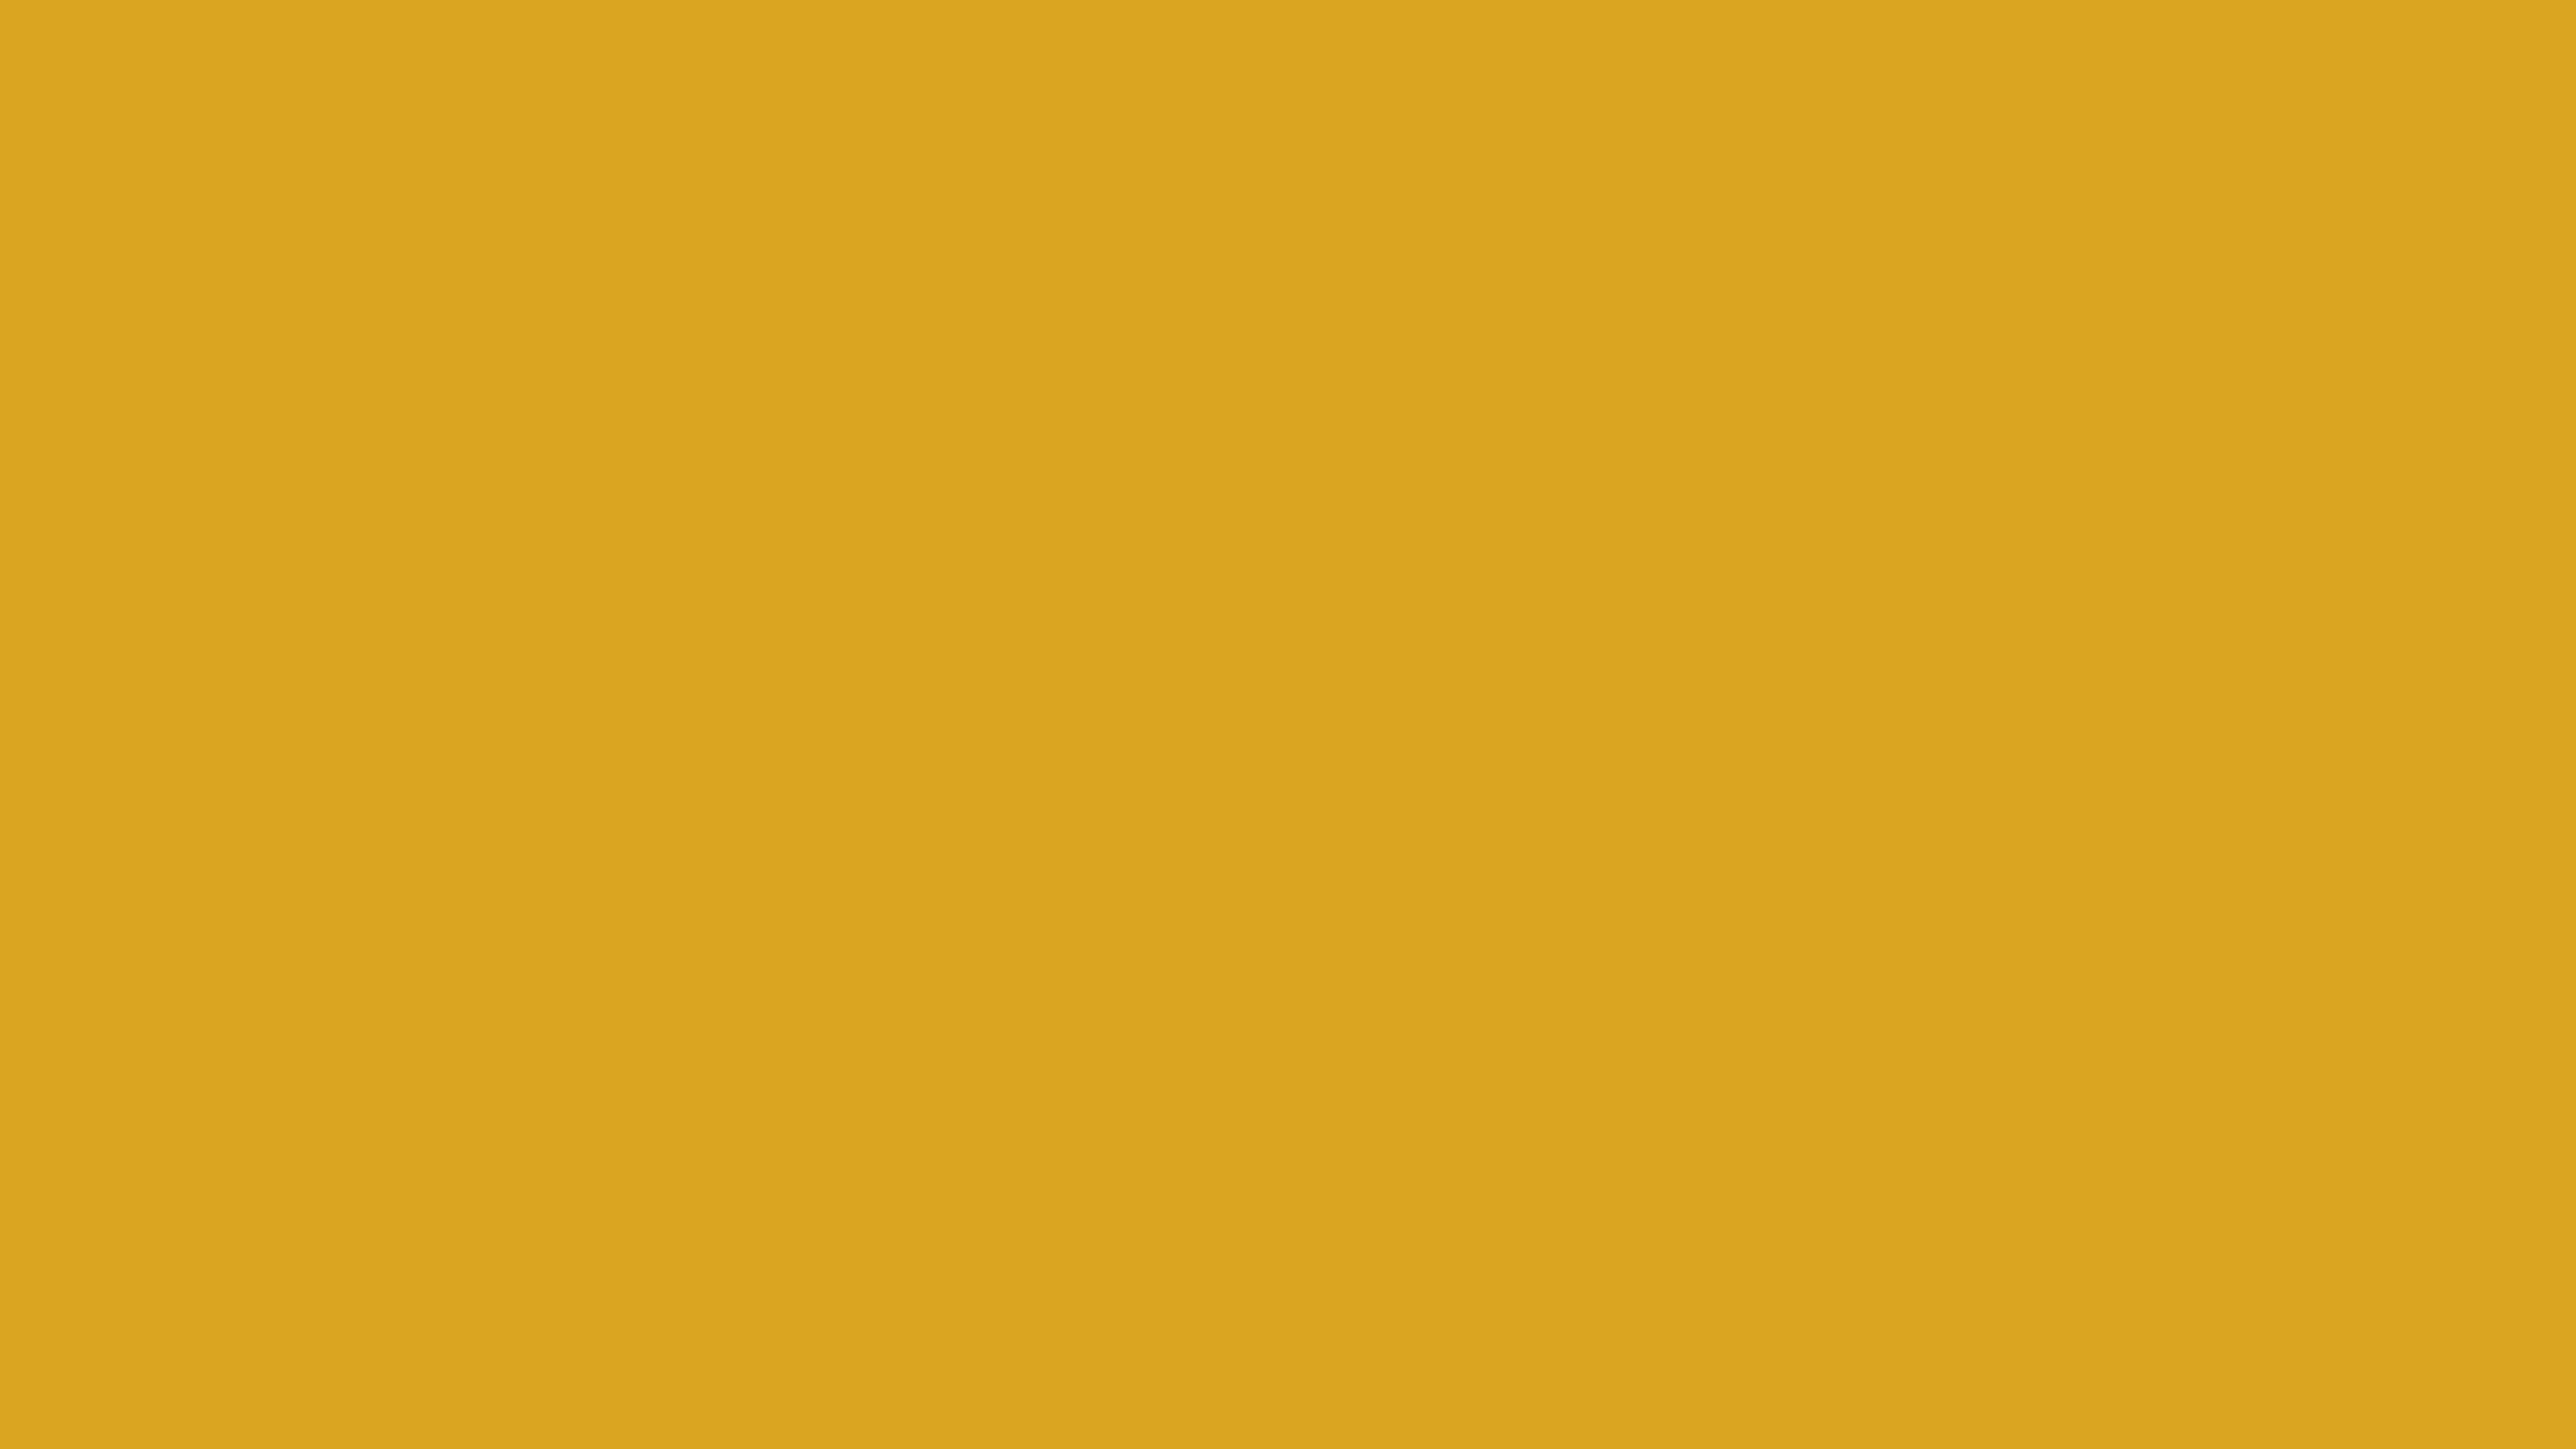 4096x2304 Goldenrod Solid Color Background